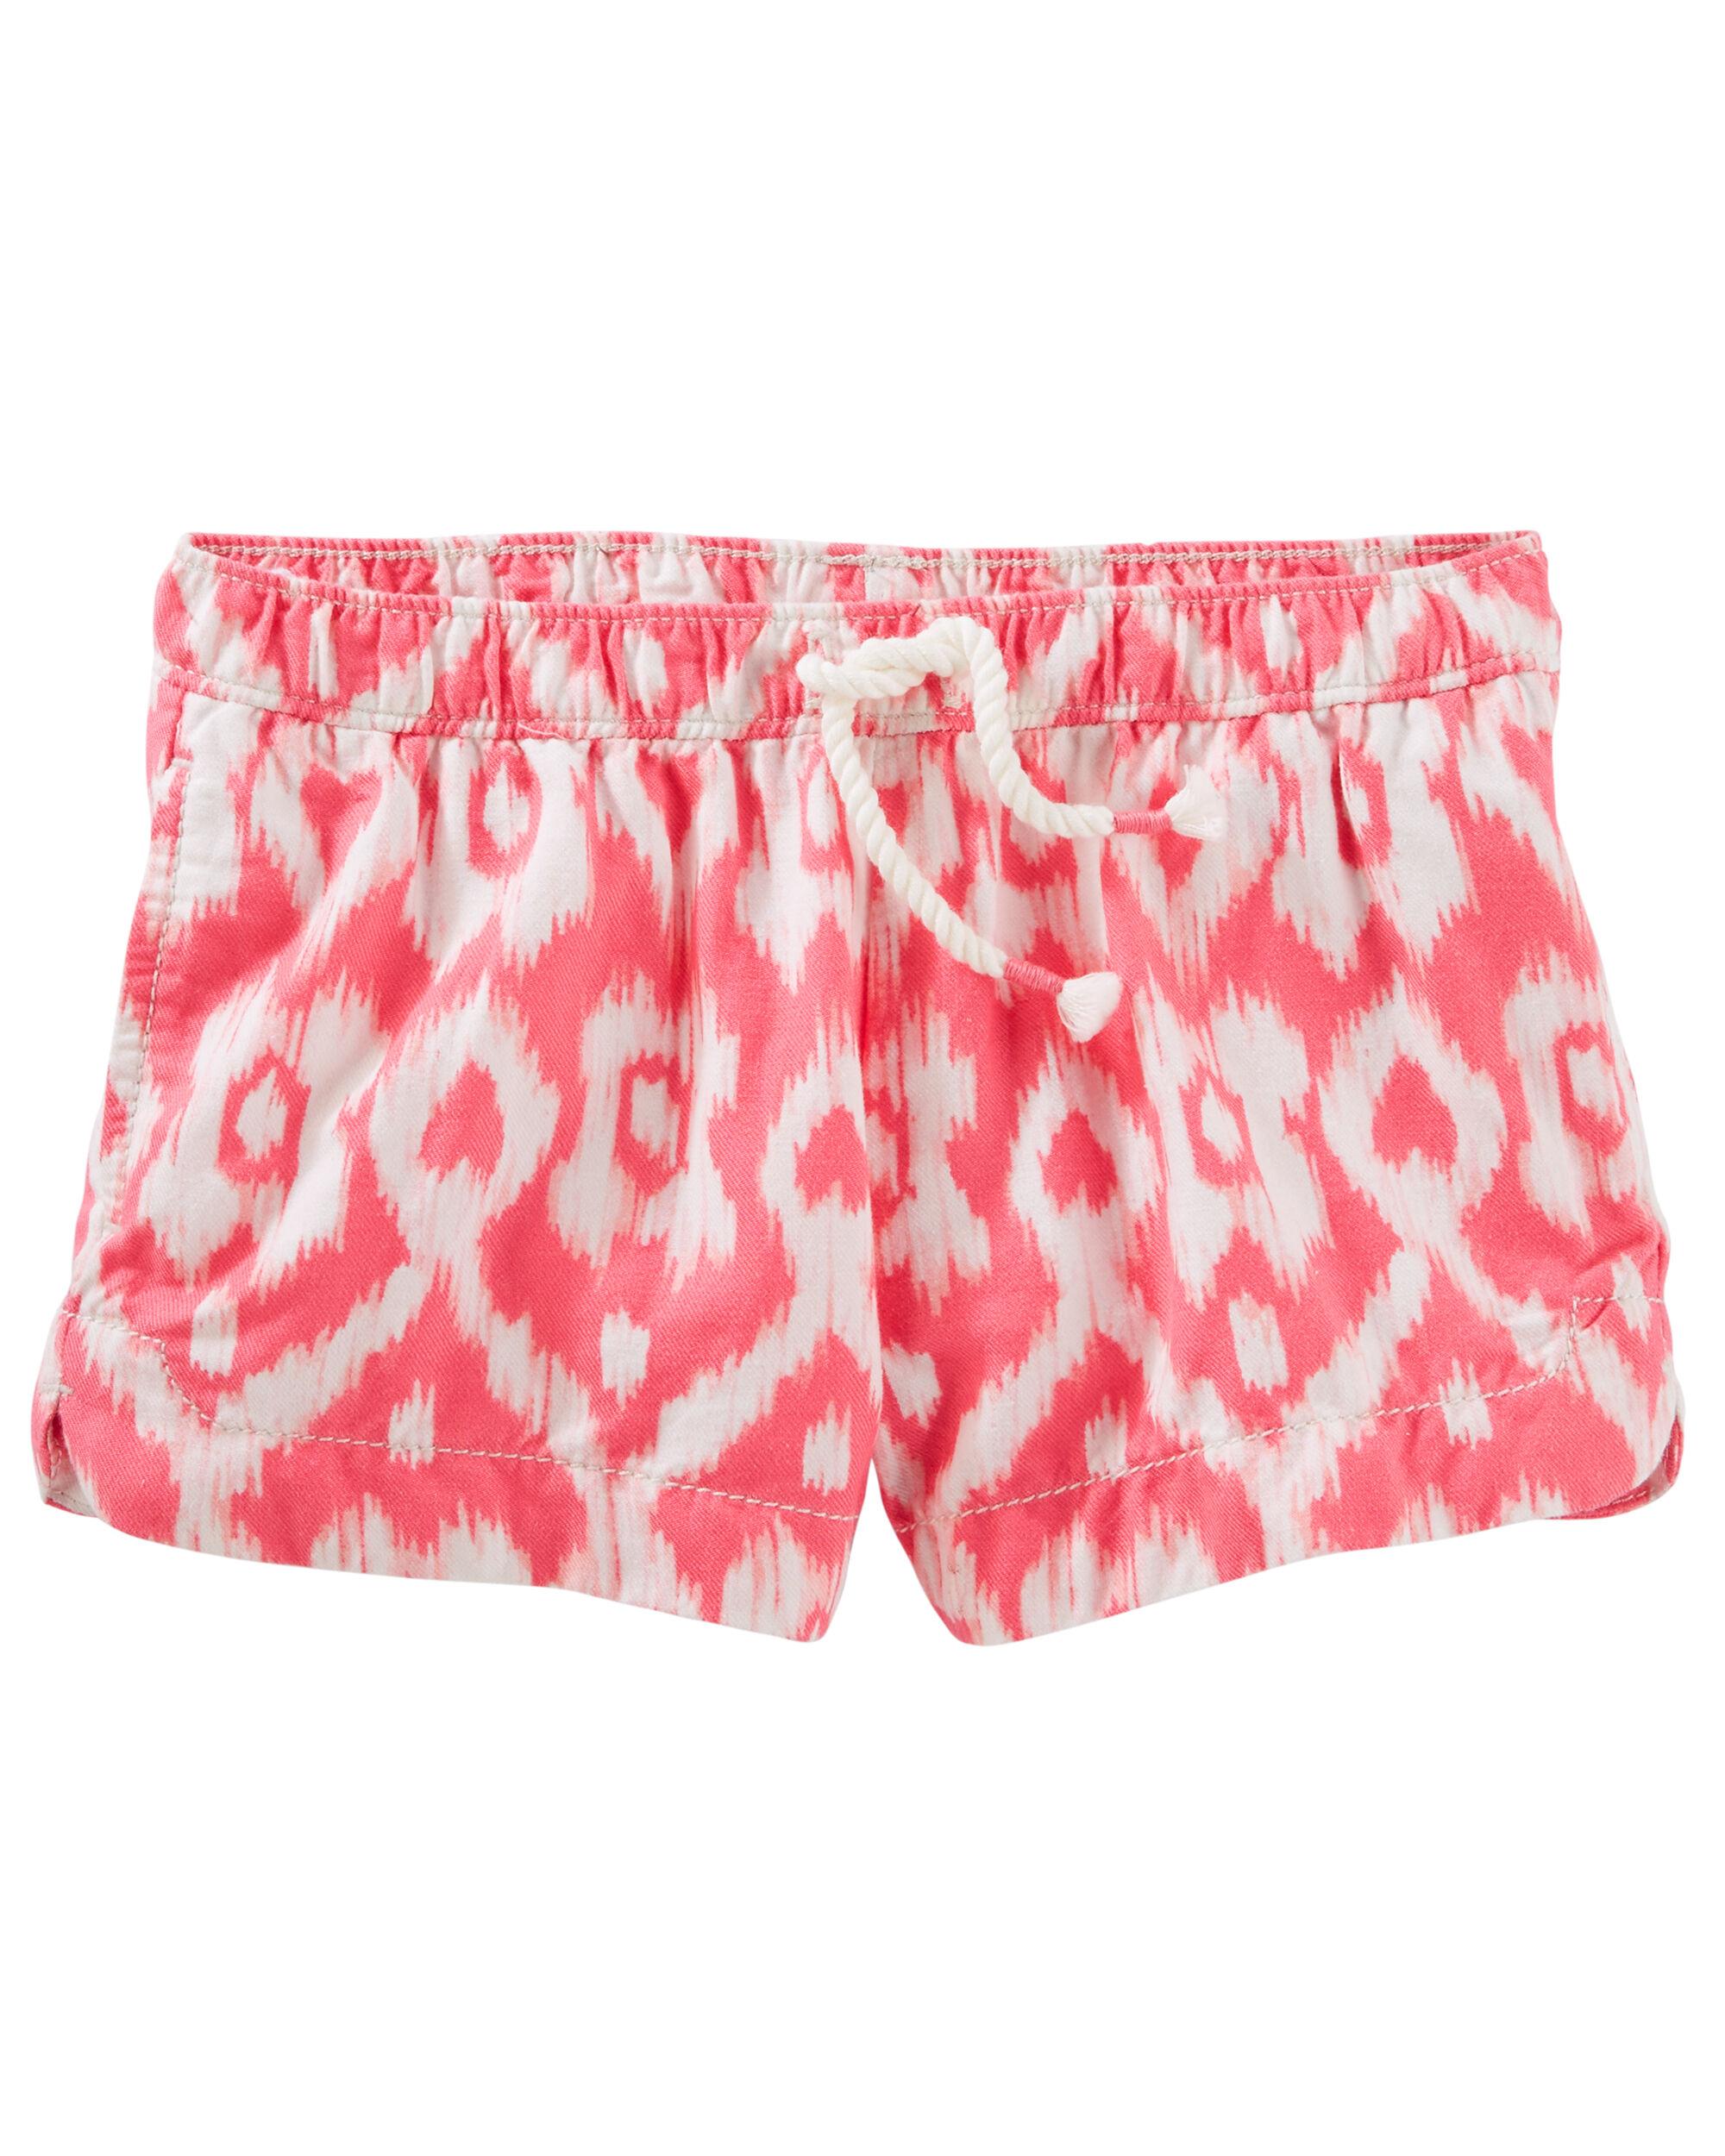 Ikat Print Sun Shorts